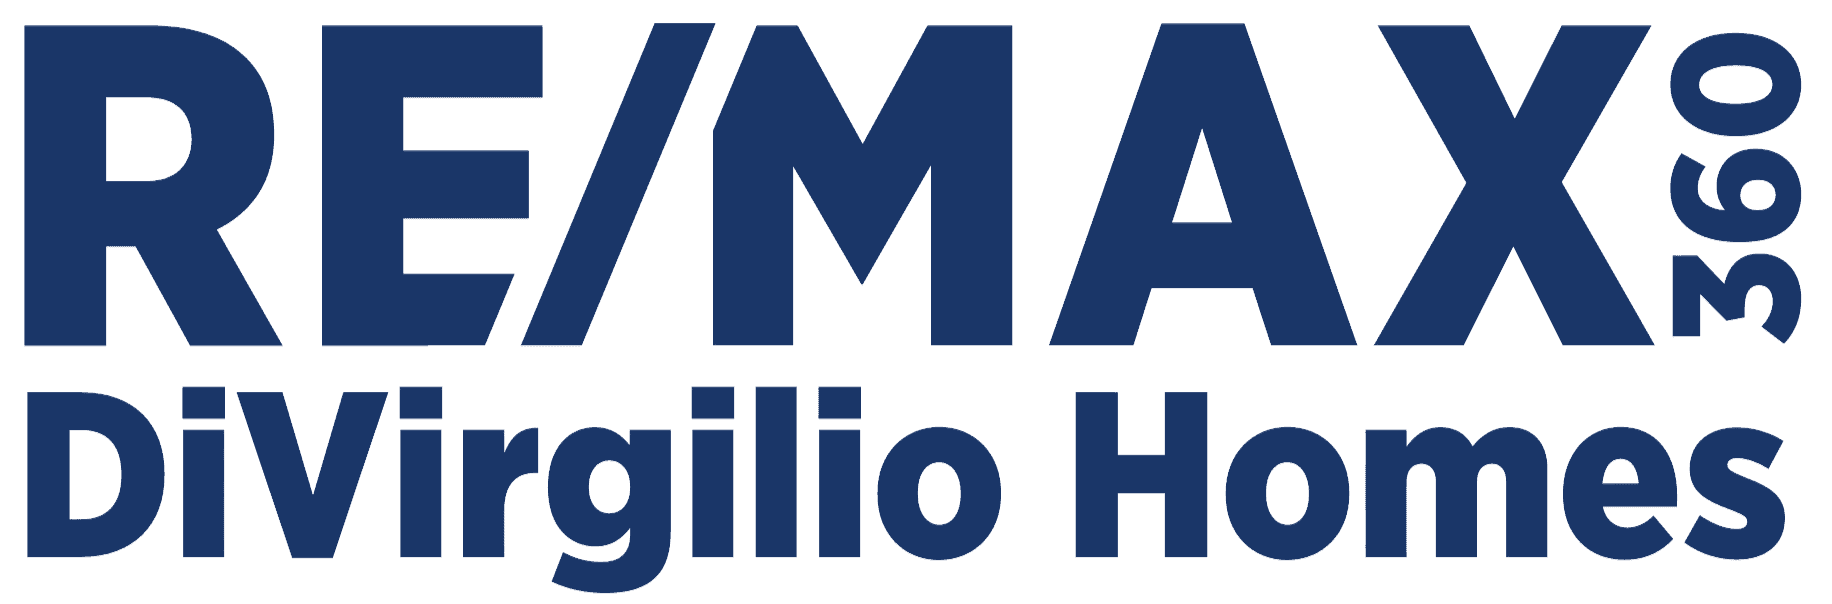 Re/Max 360 Logo